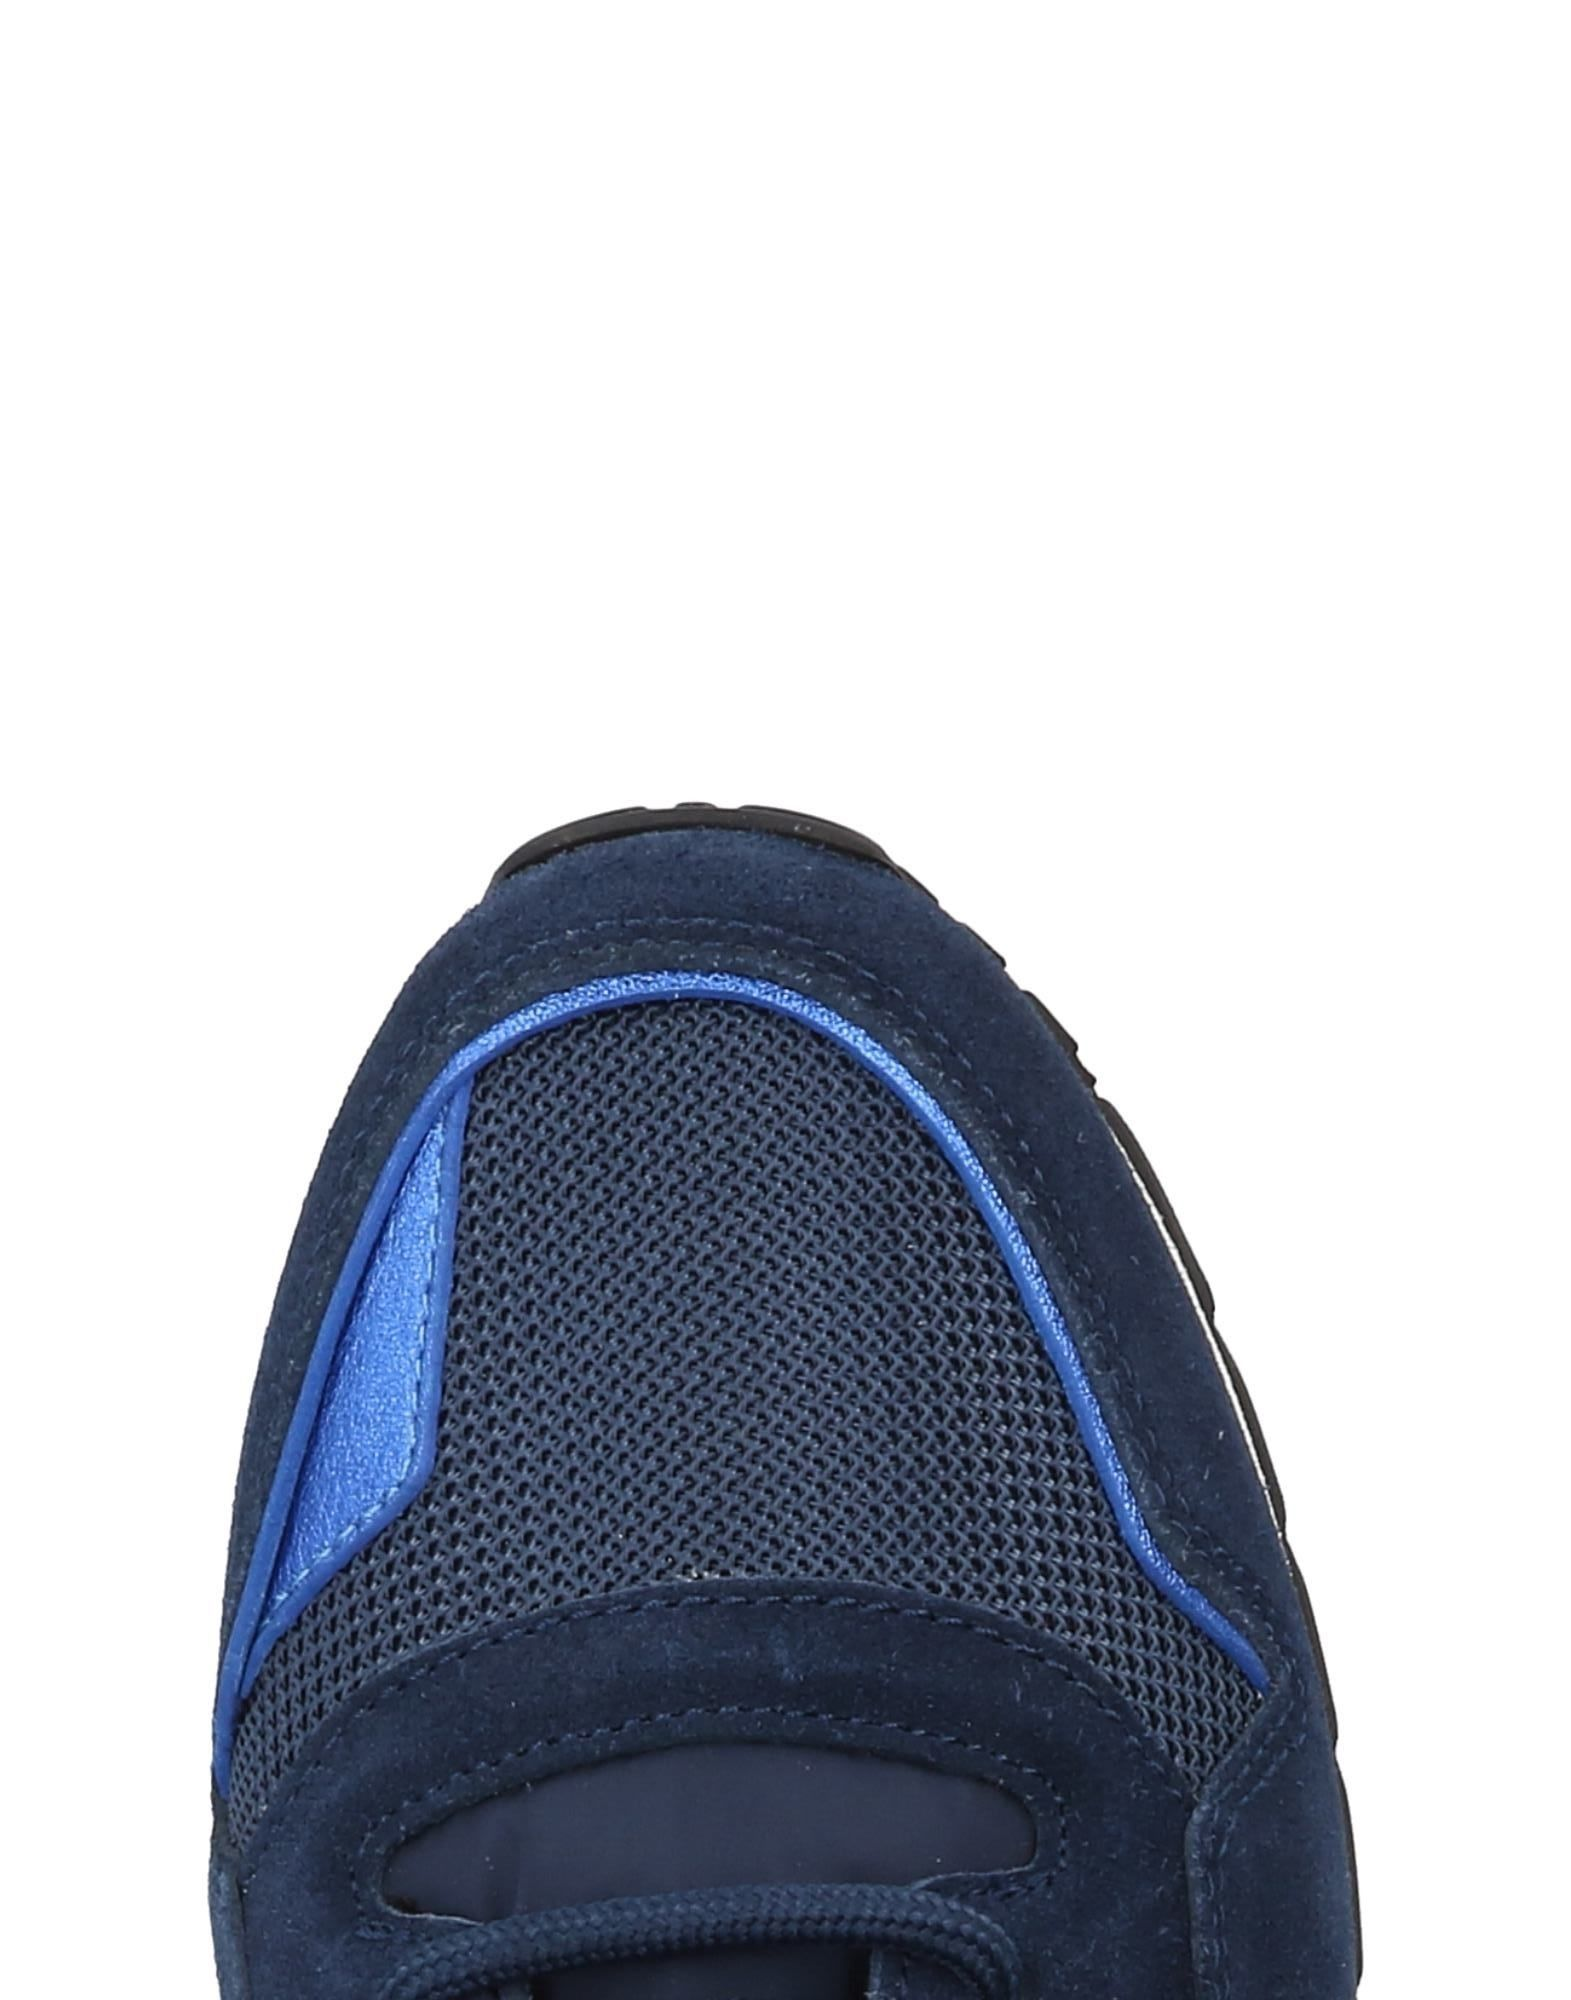 Bikkembergs Sneakers Damen  11450915PM 11450915PM  52b467